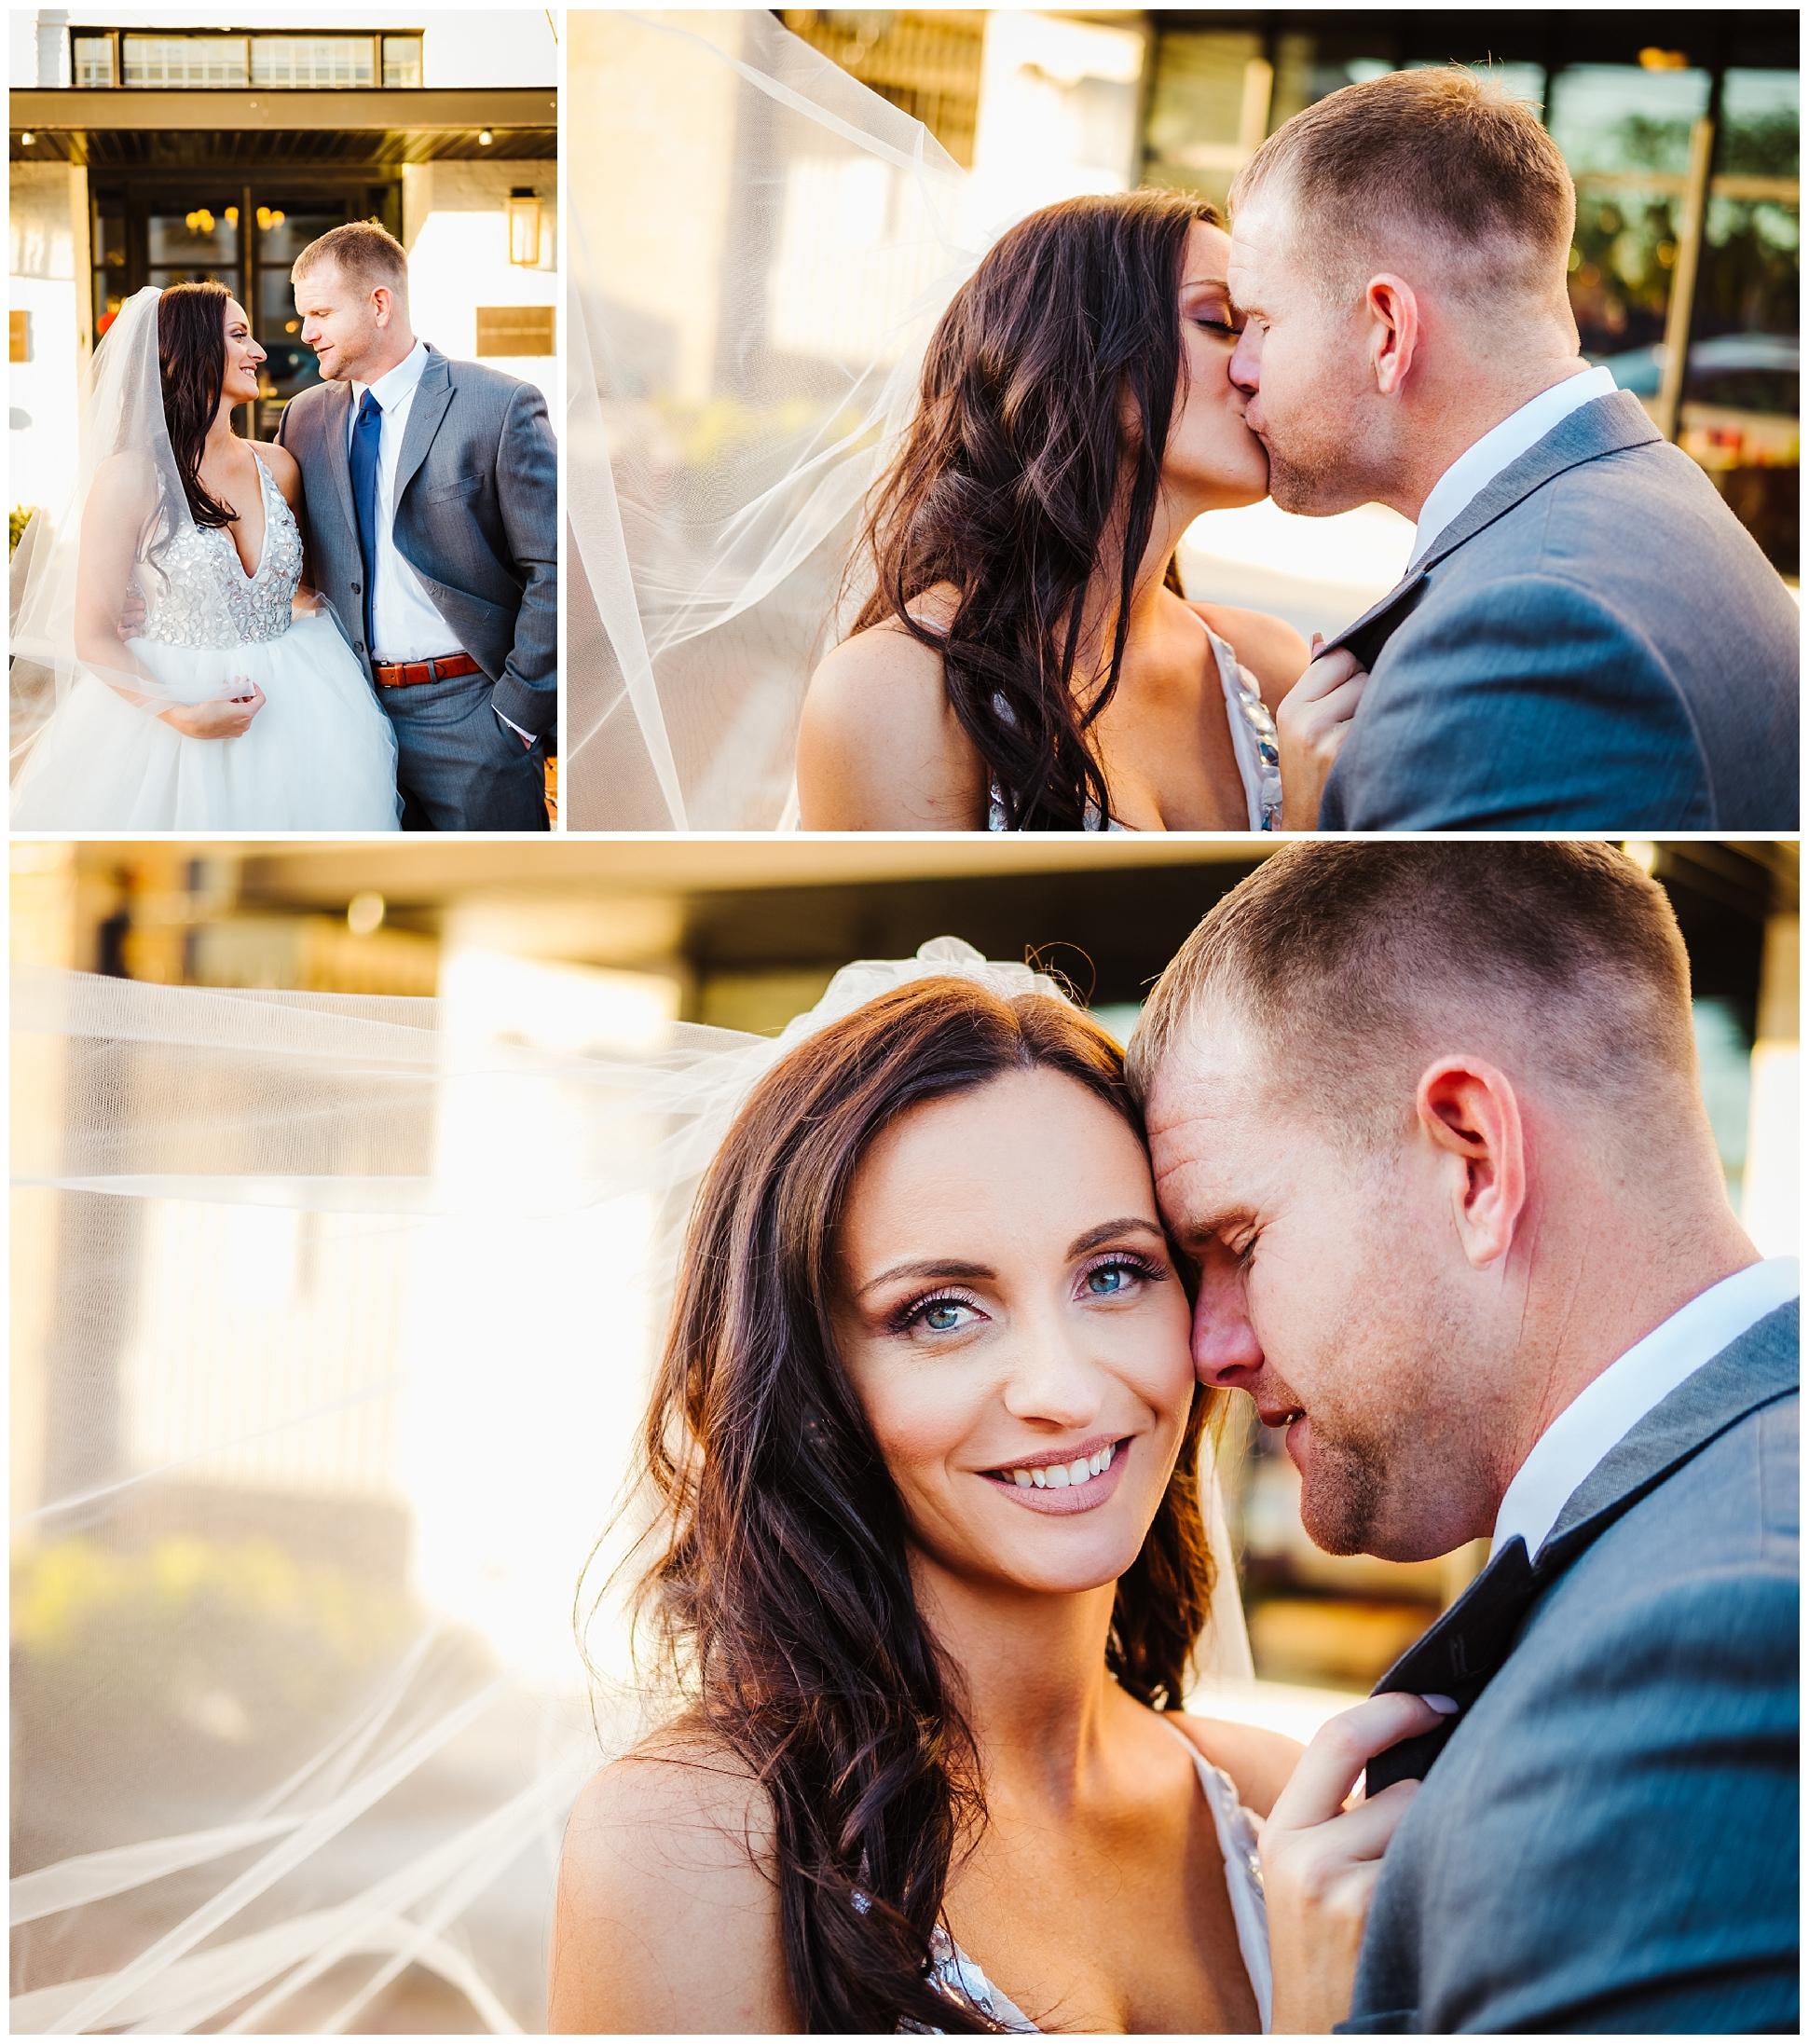 tampa-wedding-photographer-oxford-exchange-garland-candlelight-gold-hayley-paige_0027.jpg